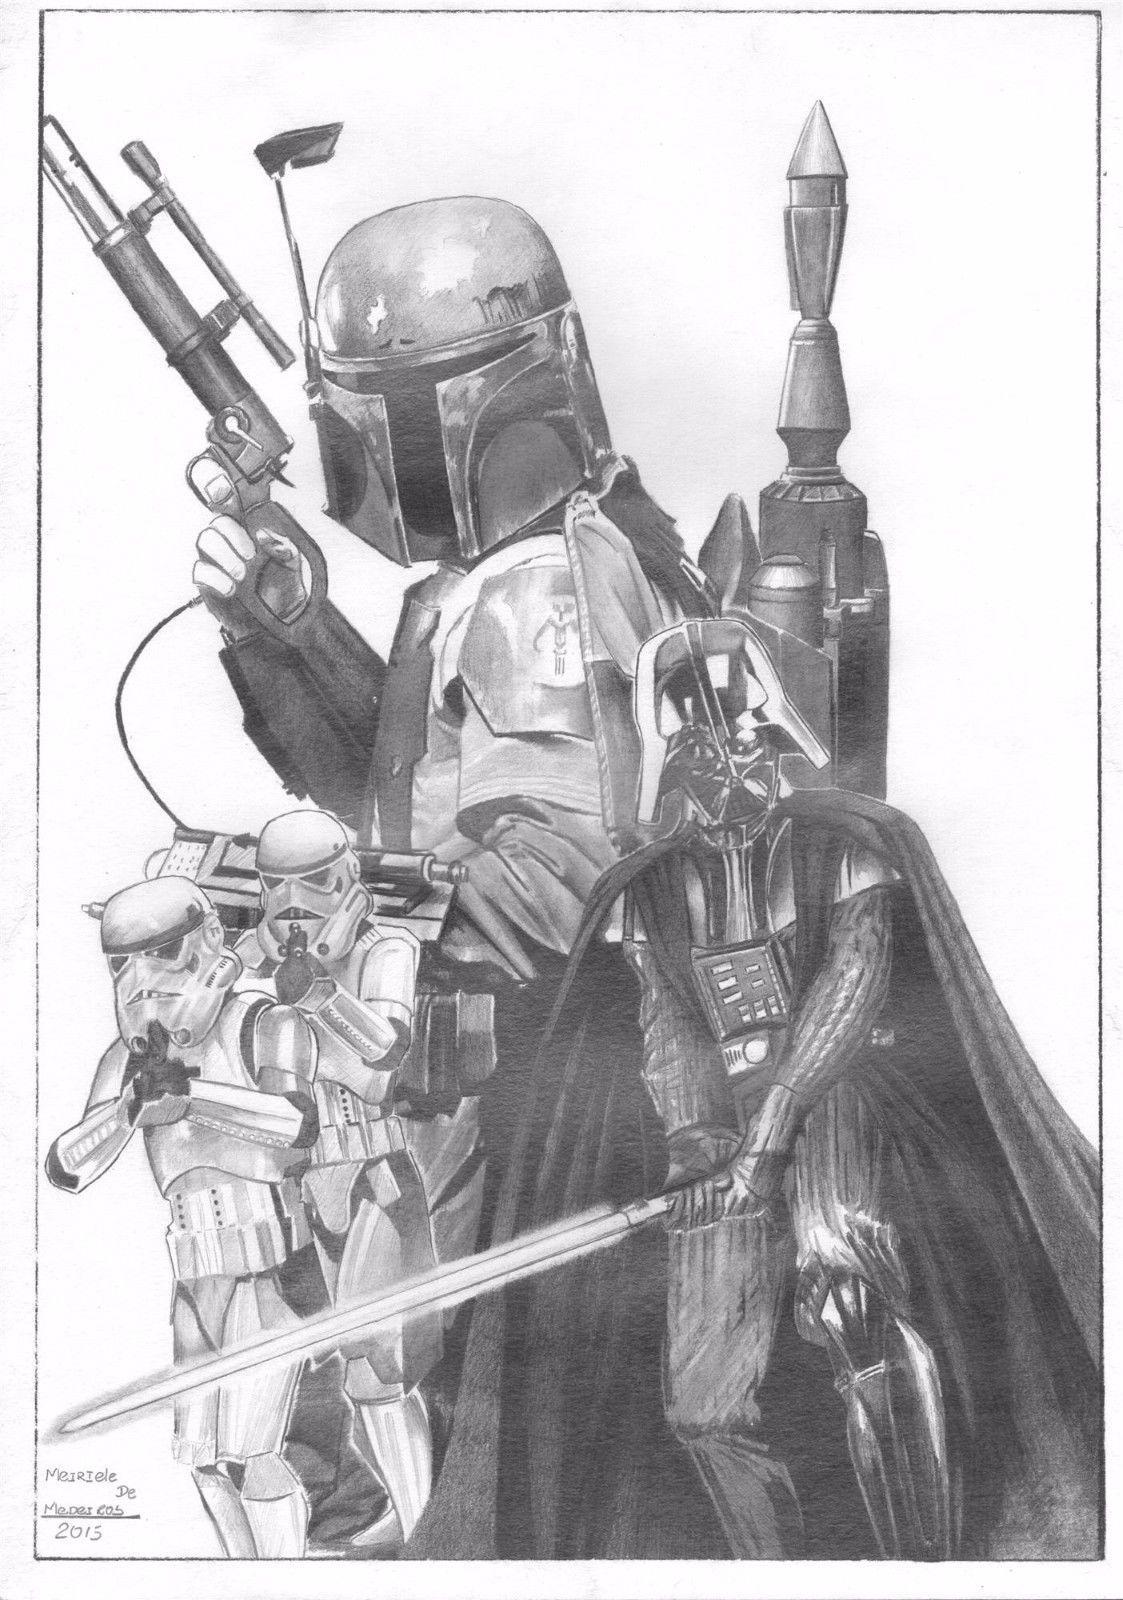 Star Wars by Meiriele de Medeiros